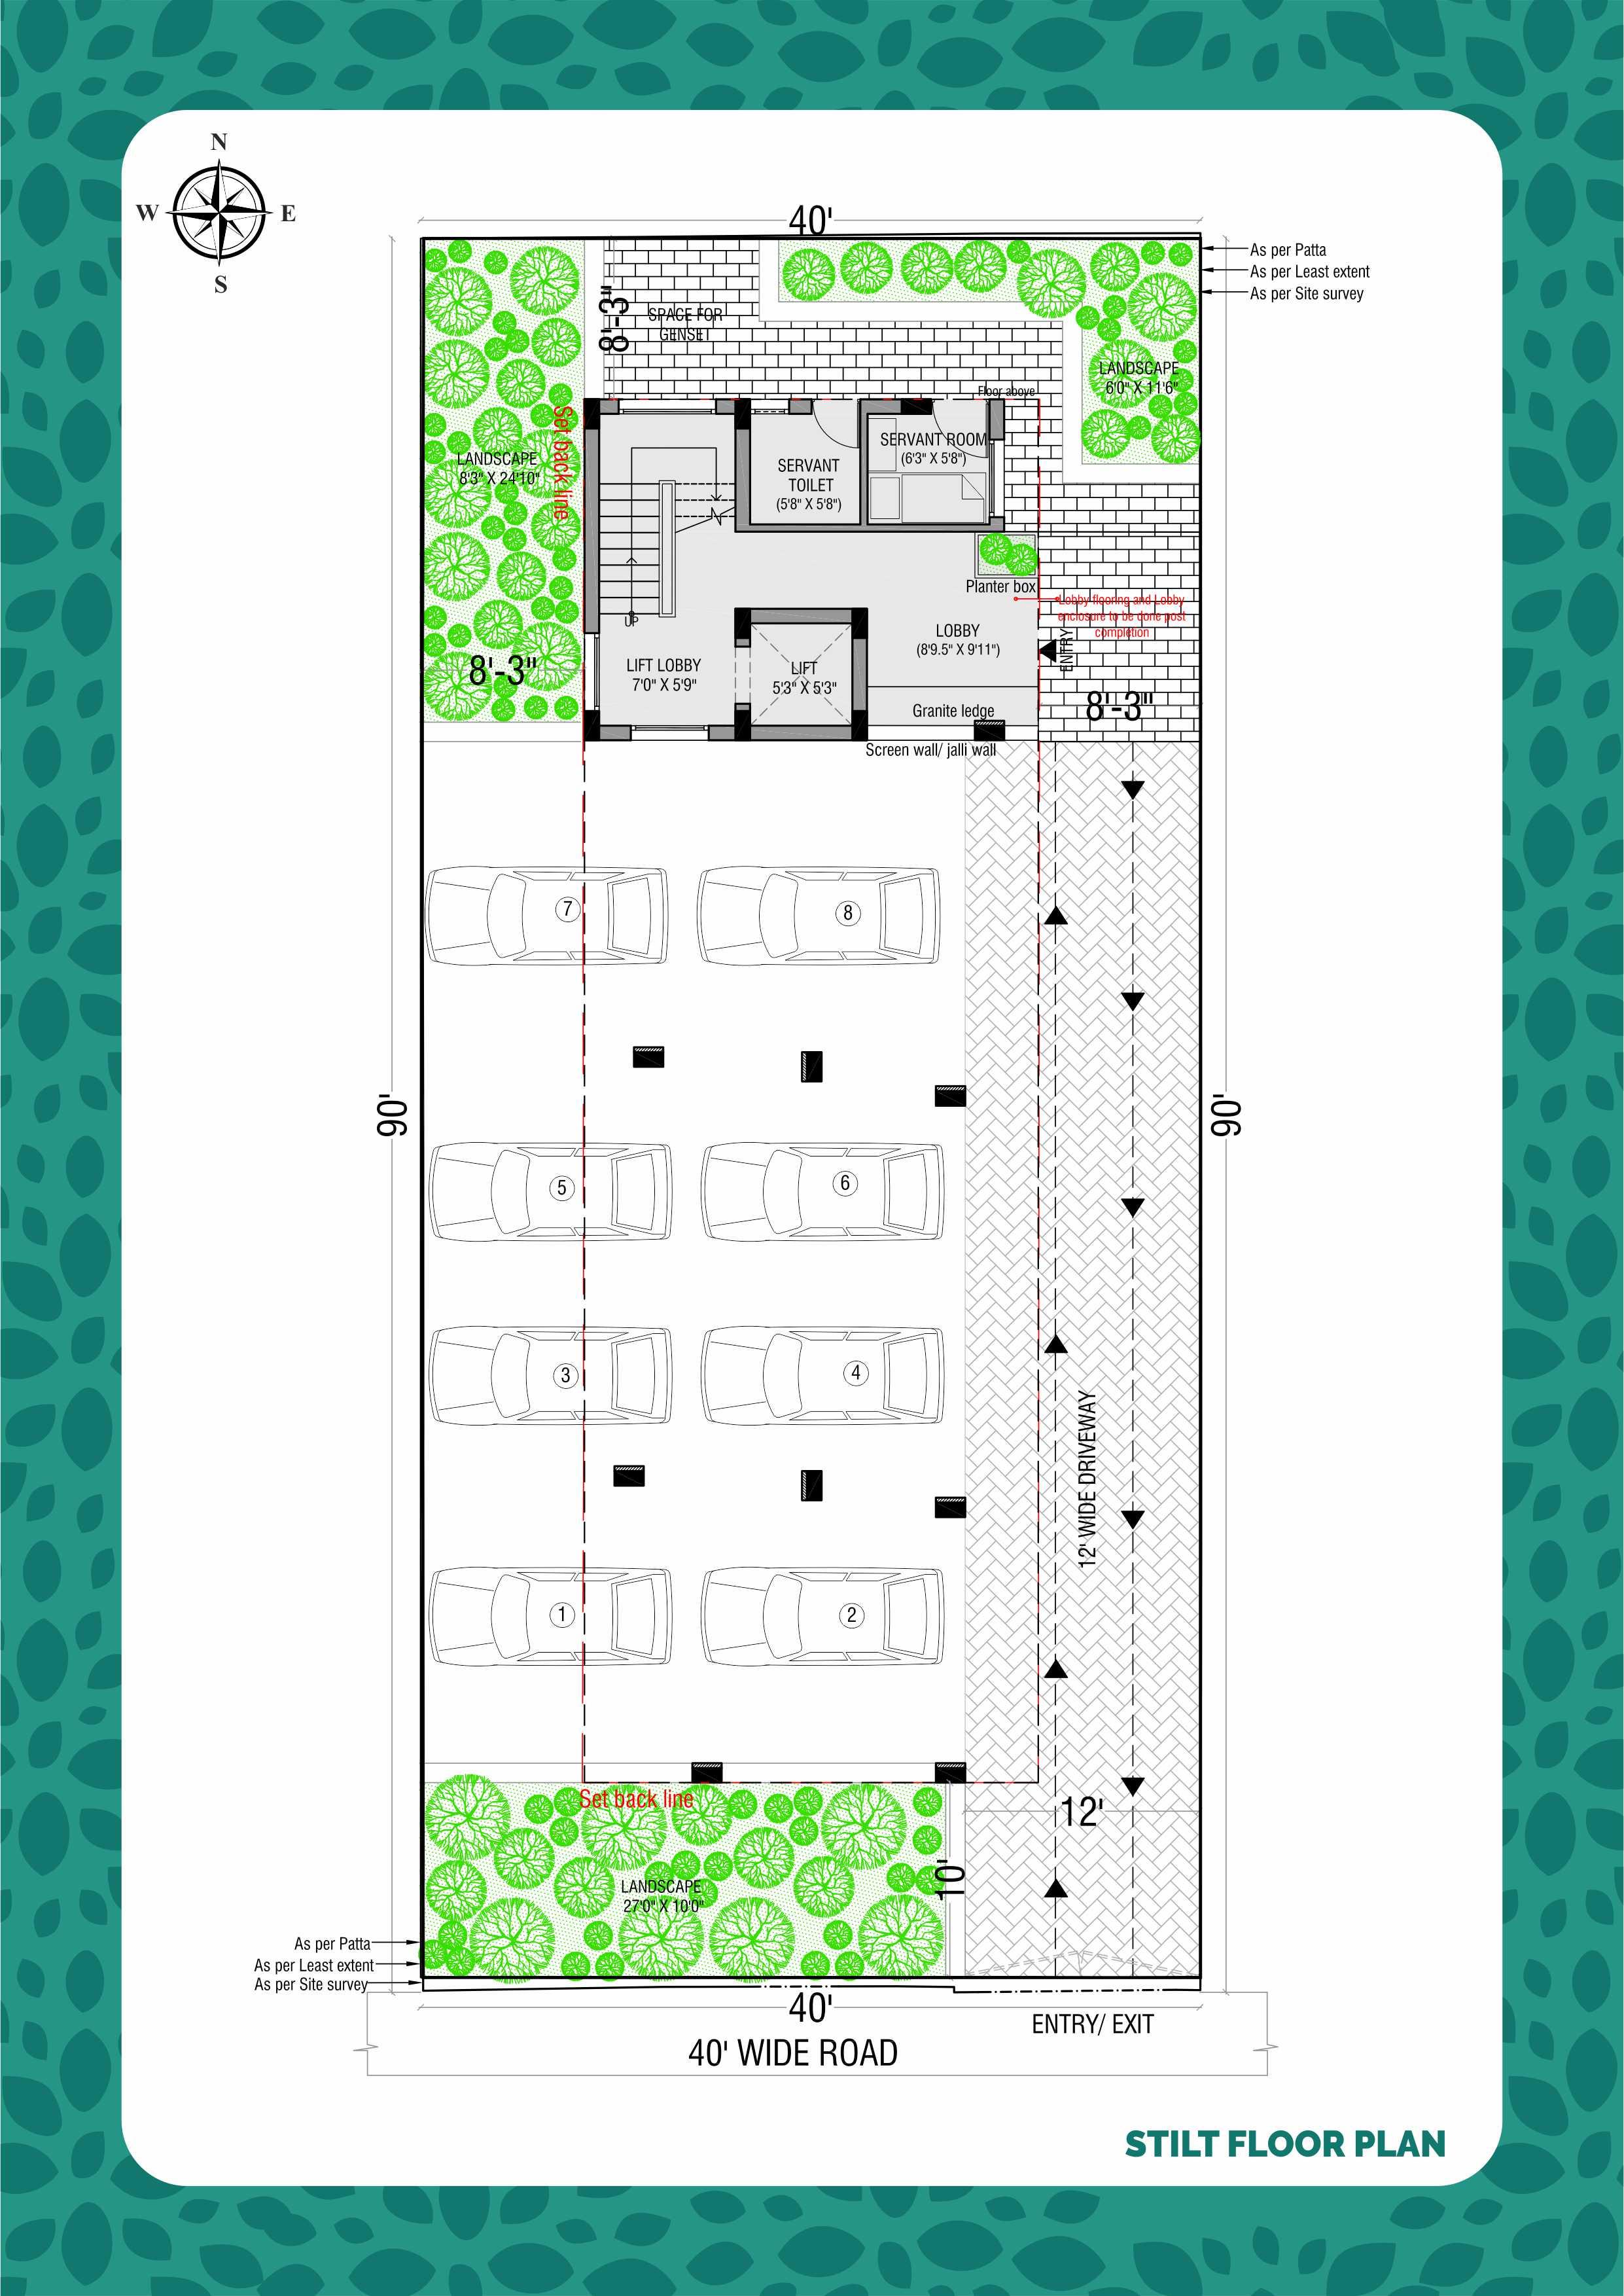 https://www.firmfoundations.in/projects/floorplans/thumbnails/16087159486Amrapali_Car.jpg